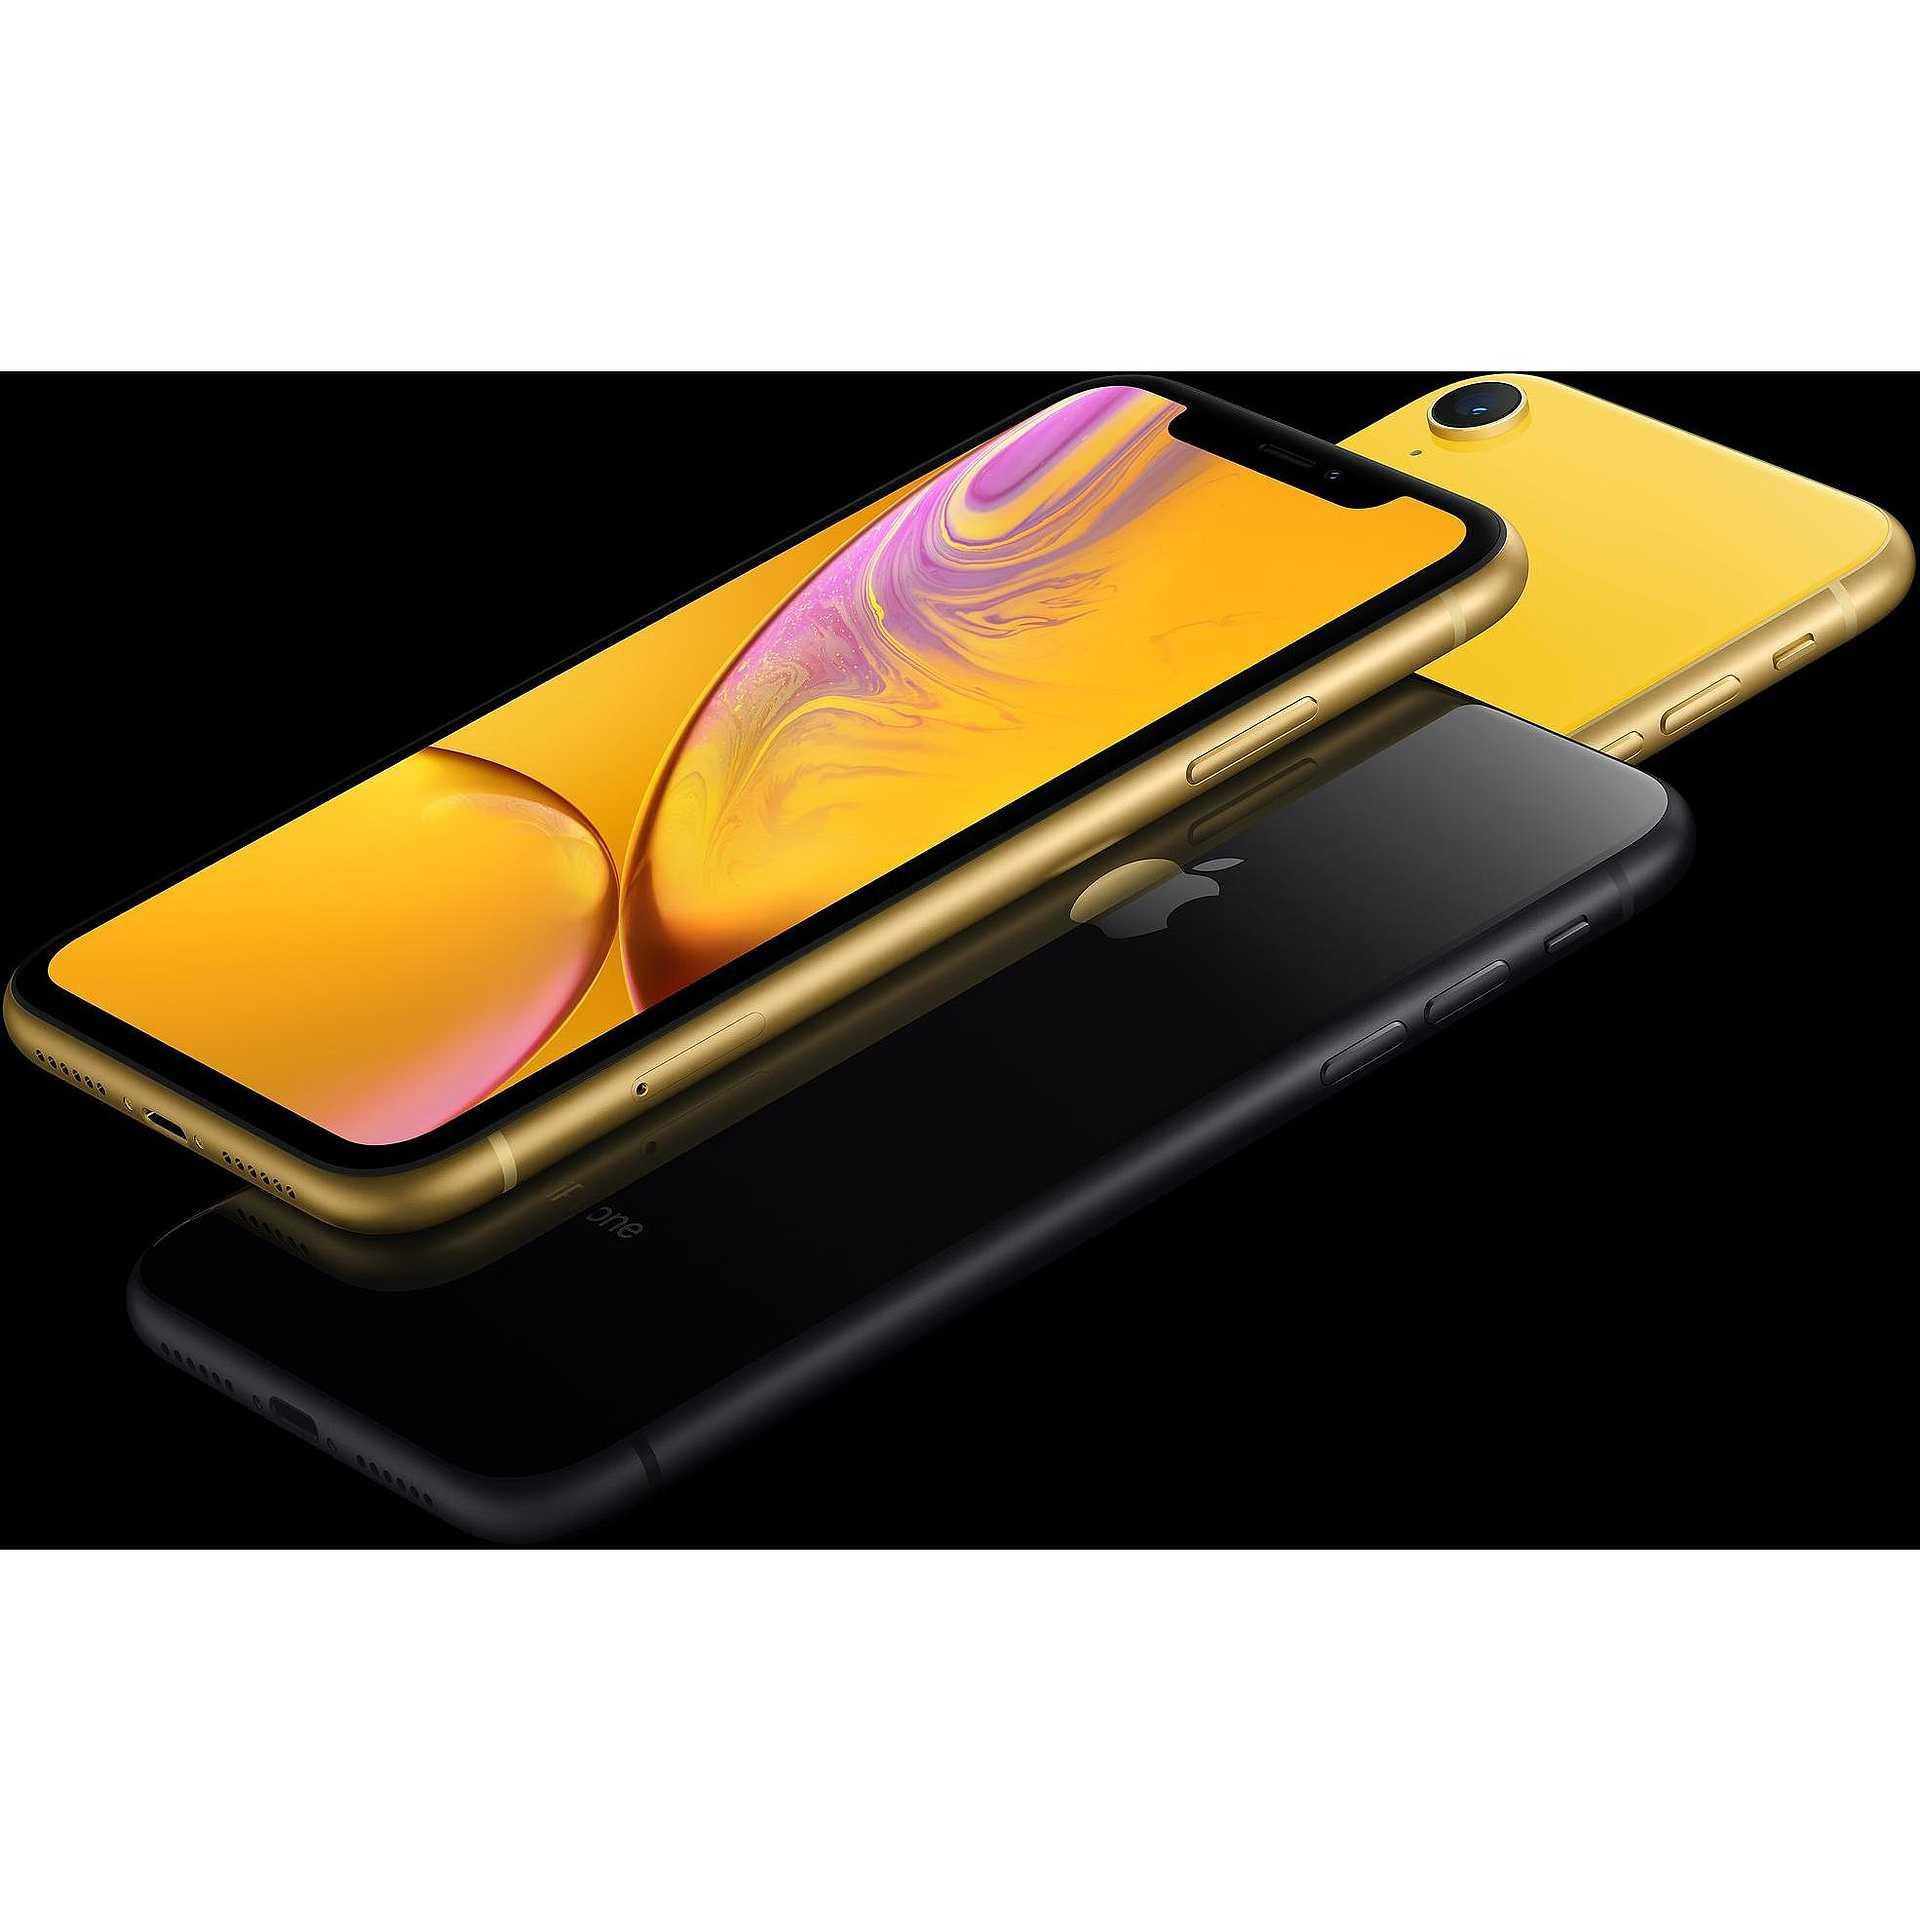 Apple Mry72qla Iphone Xr Smartphone Display Lcd 61 Liquid Retina